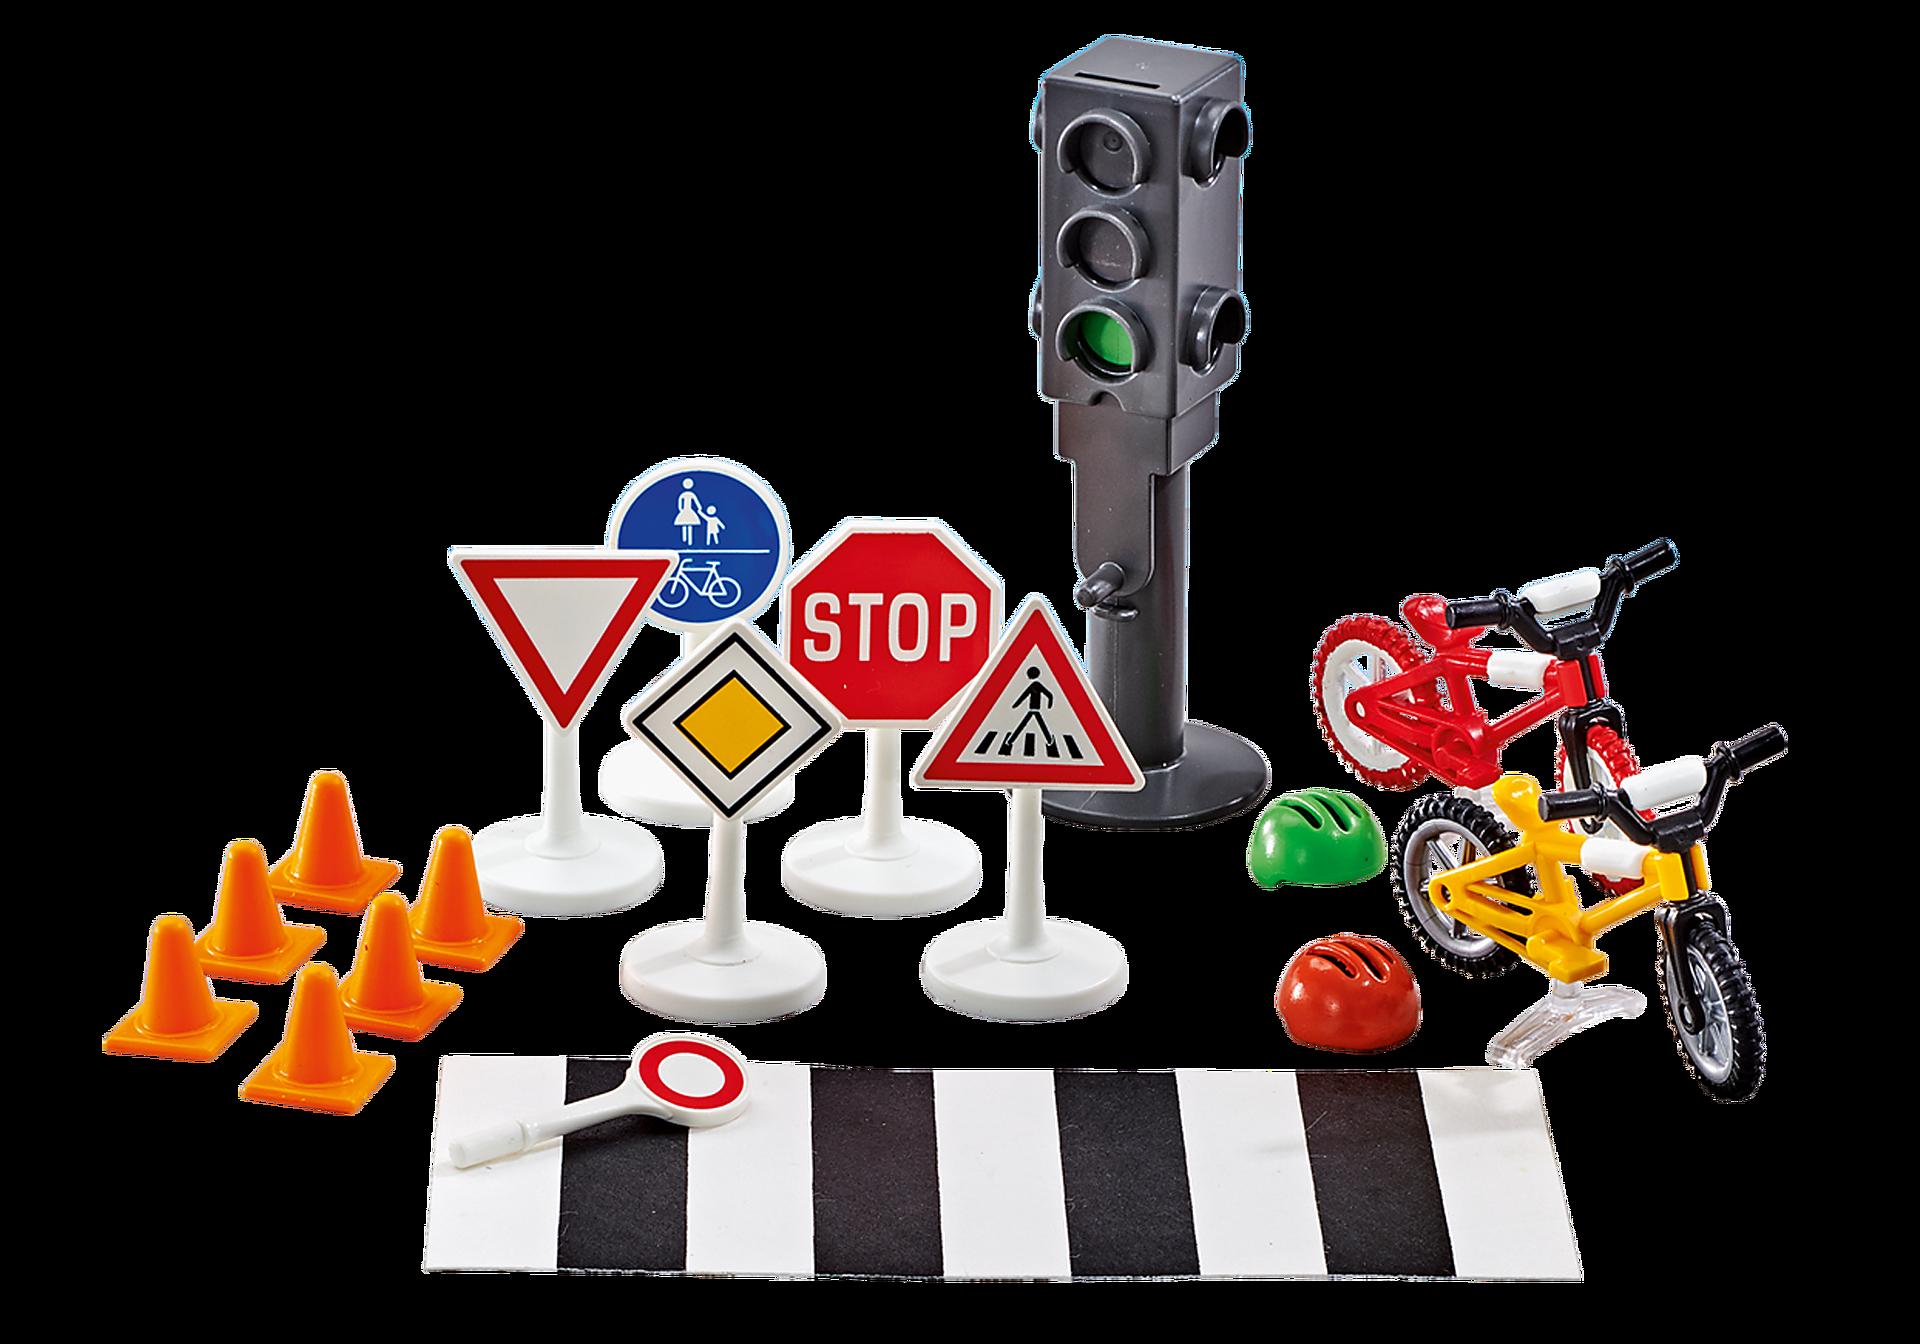 9812 Road Safety Set zoom image1